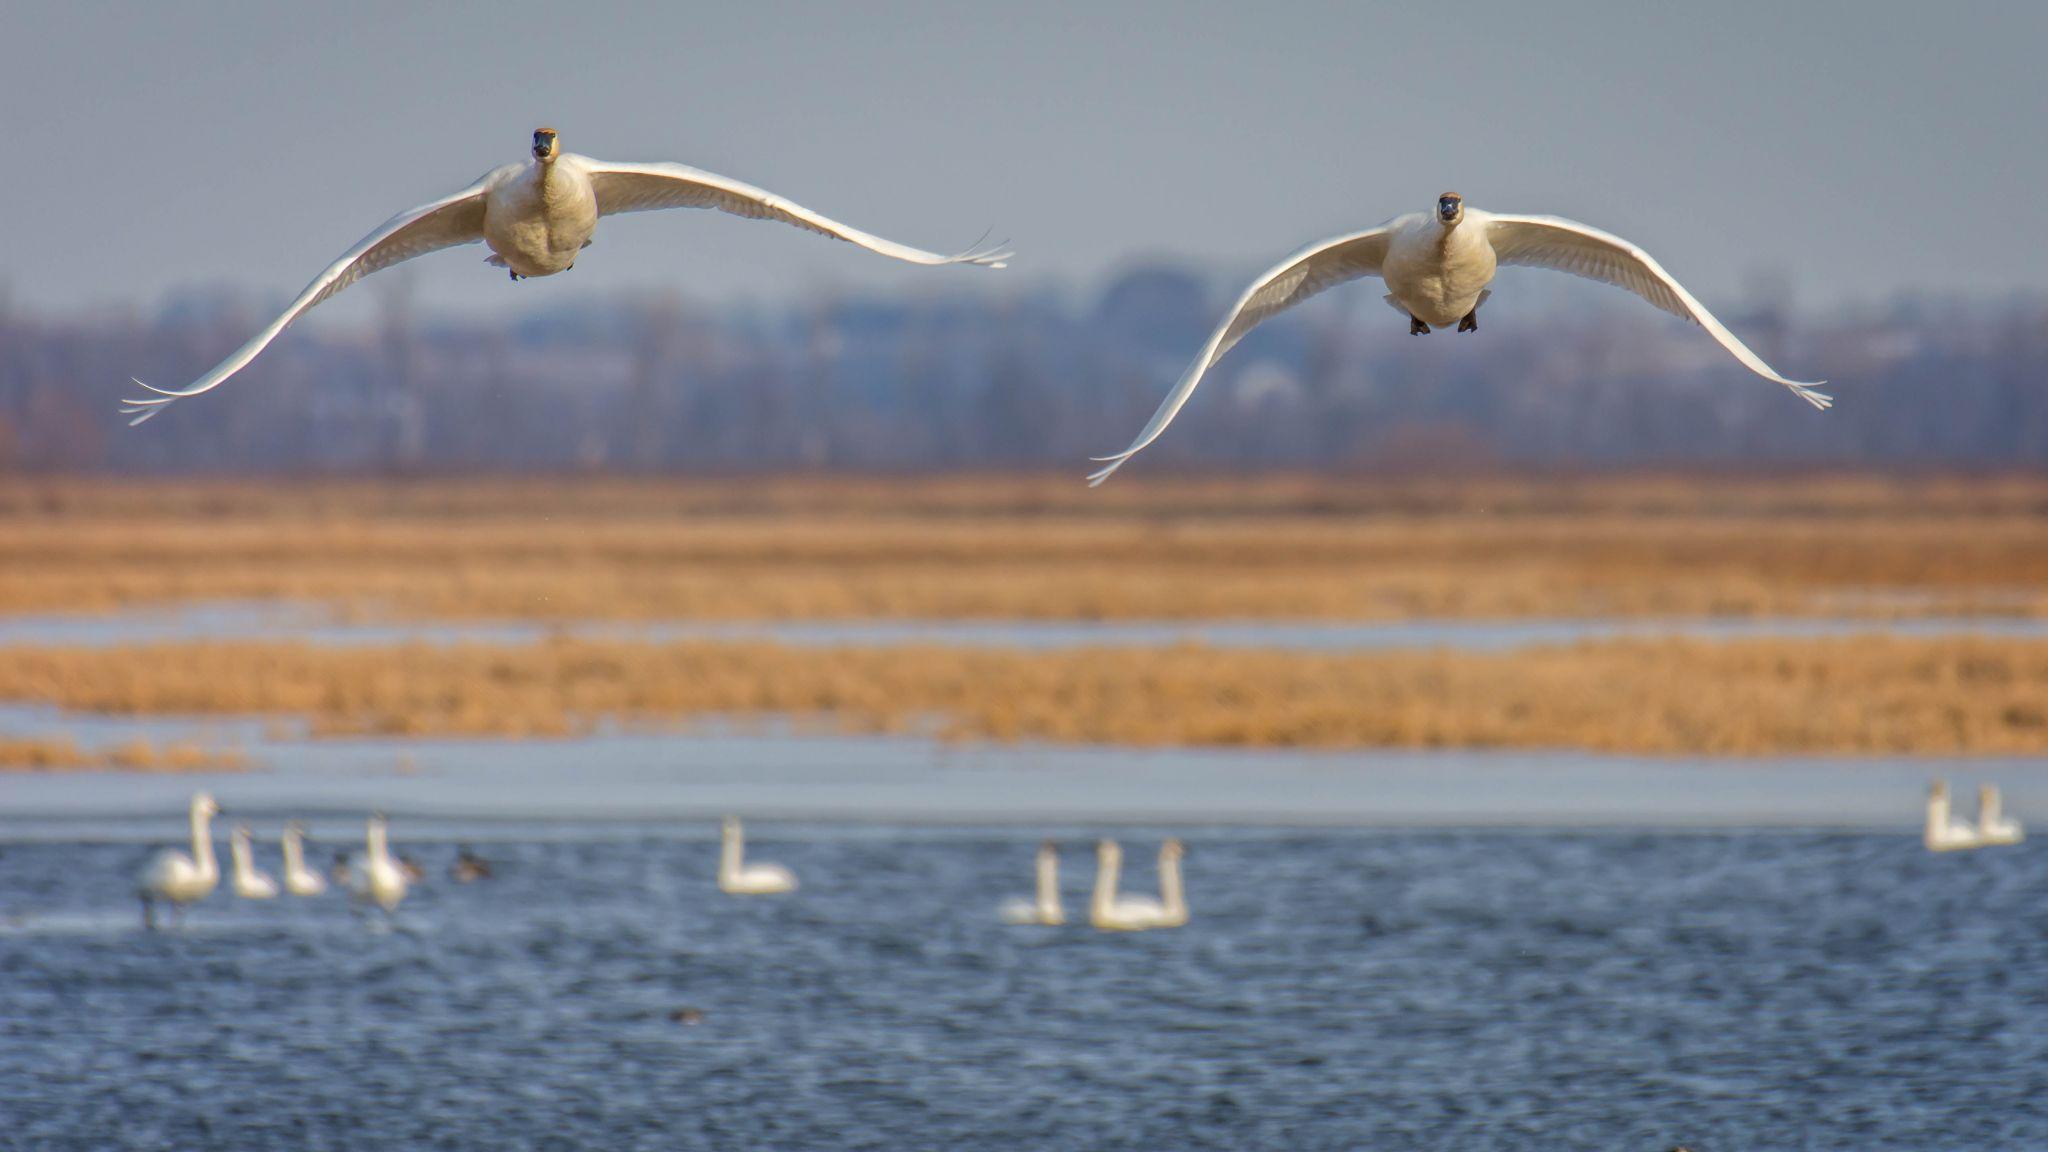 Loess Bluffs National Wildlife Refuge, USA